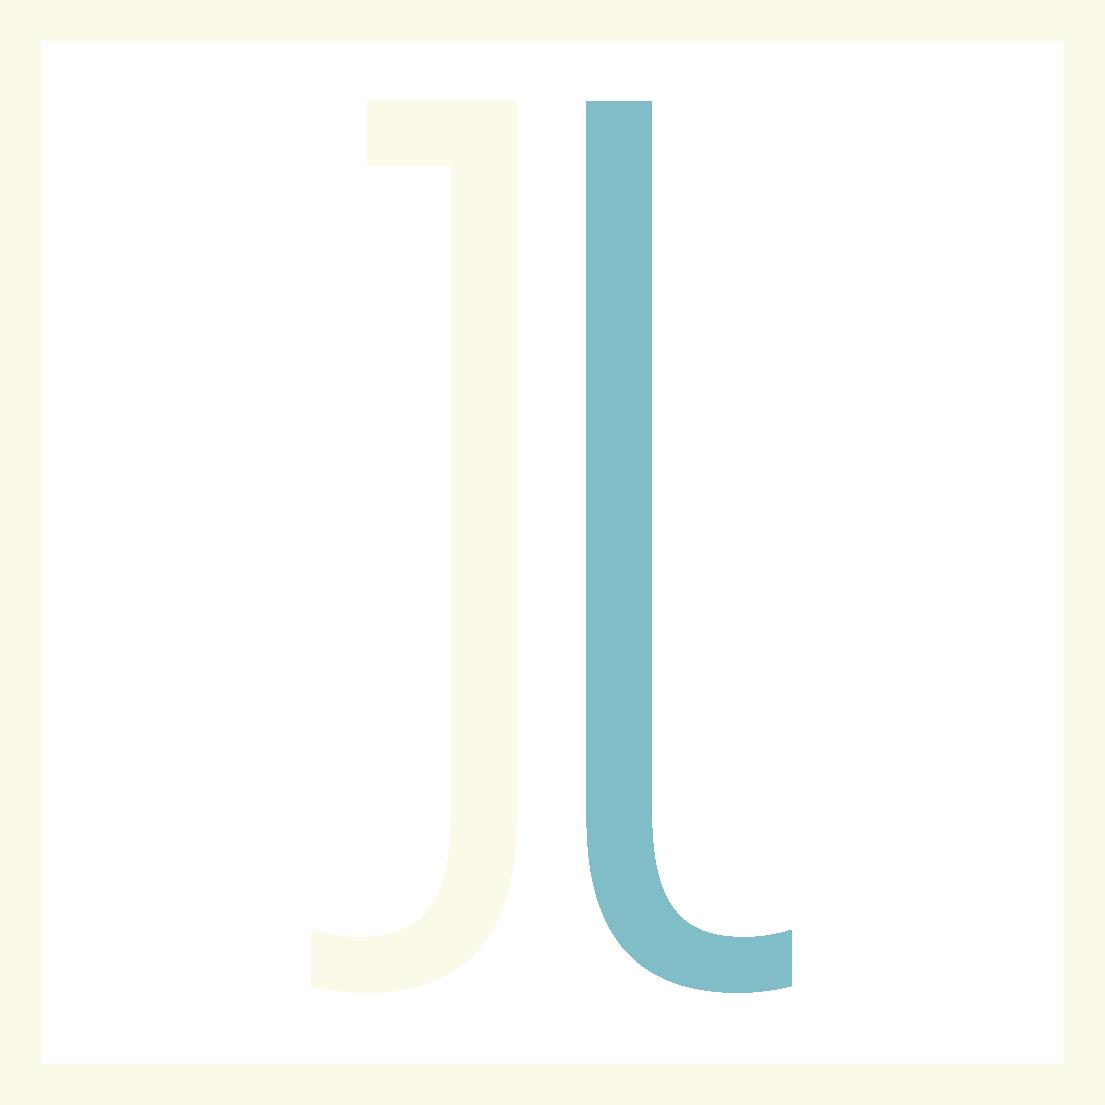 Fashion brand design whit-out monogram